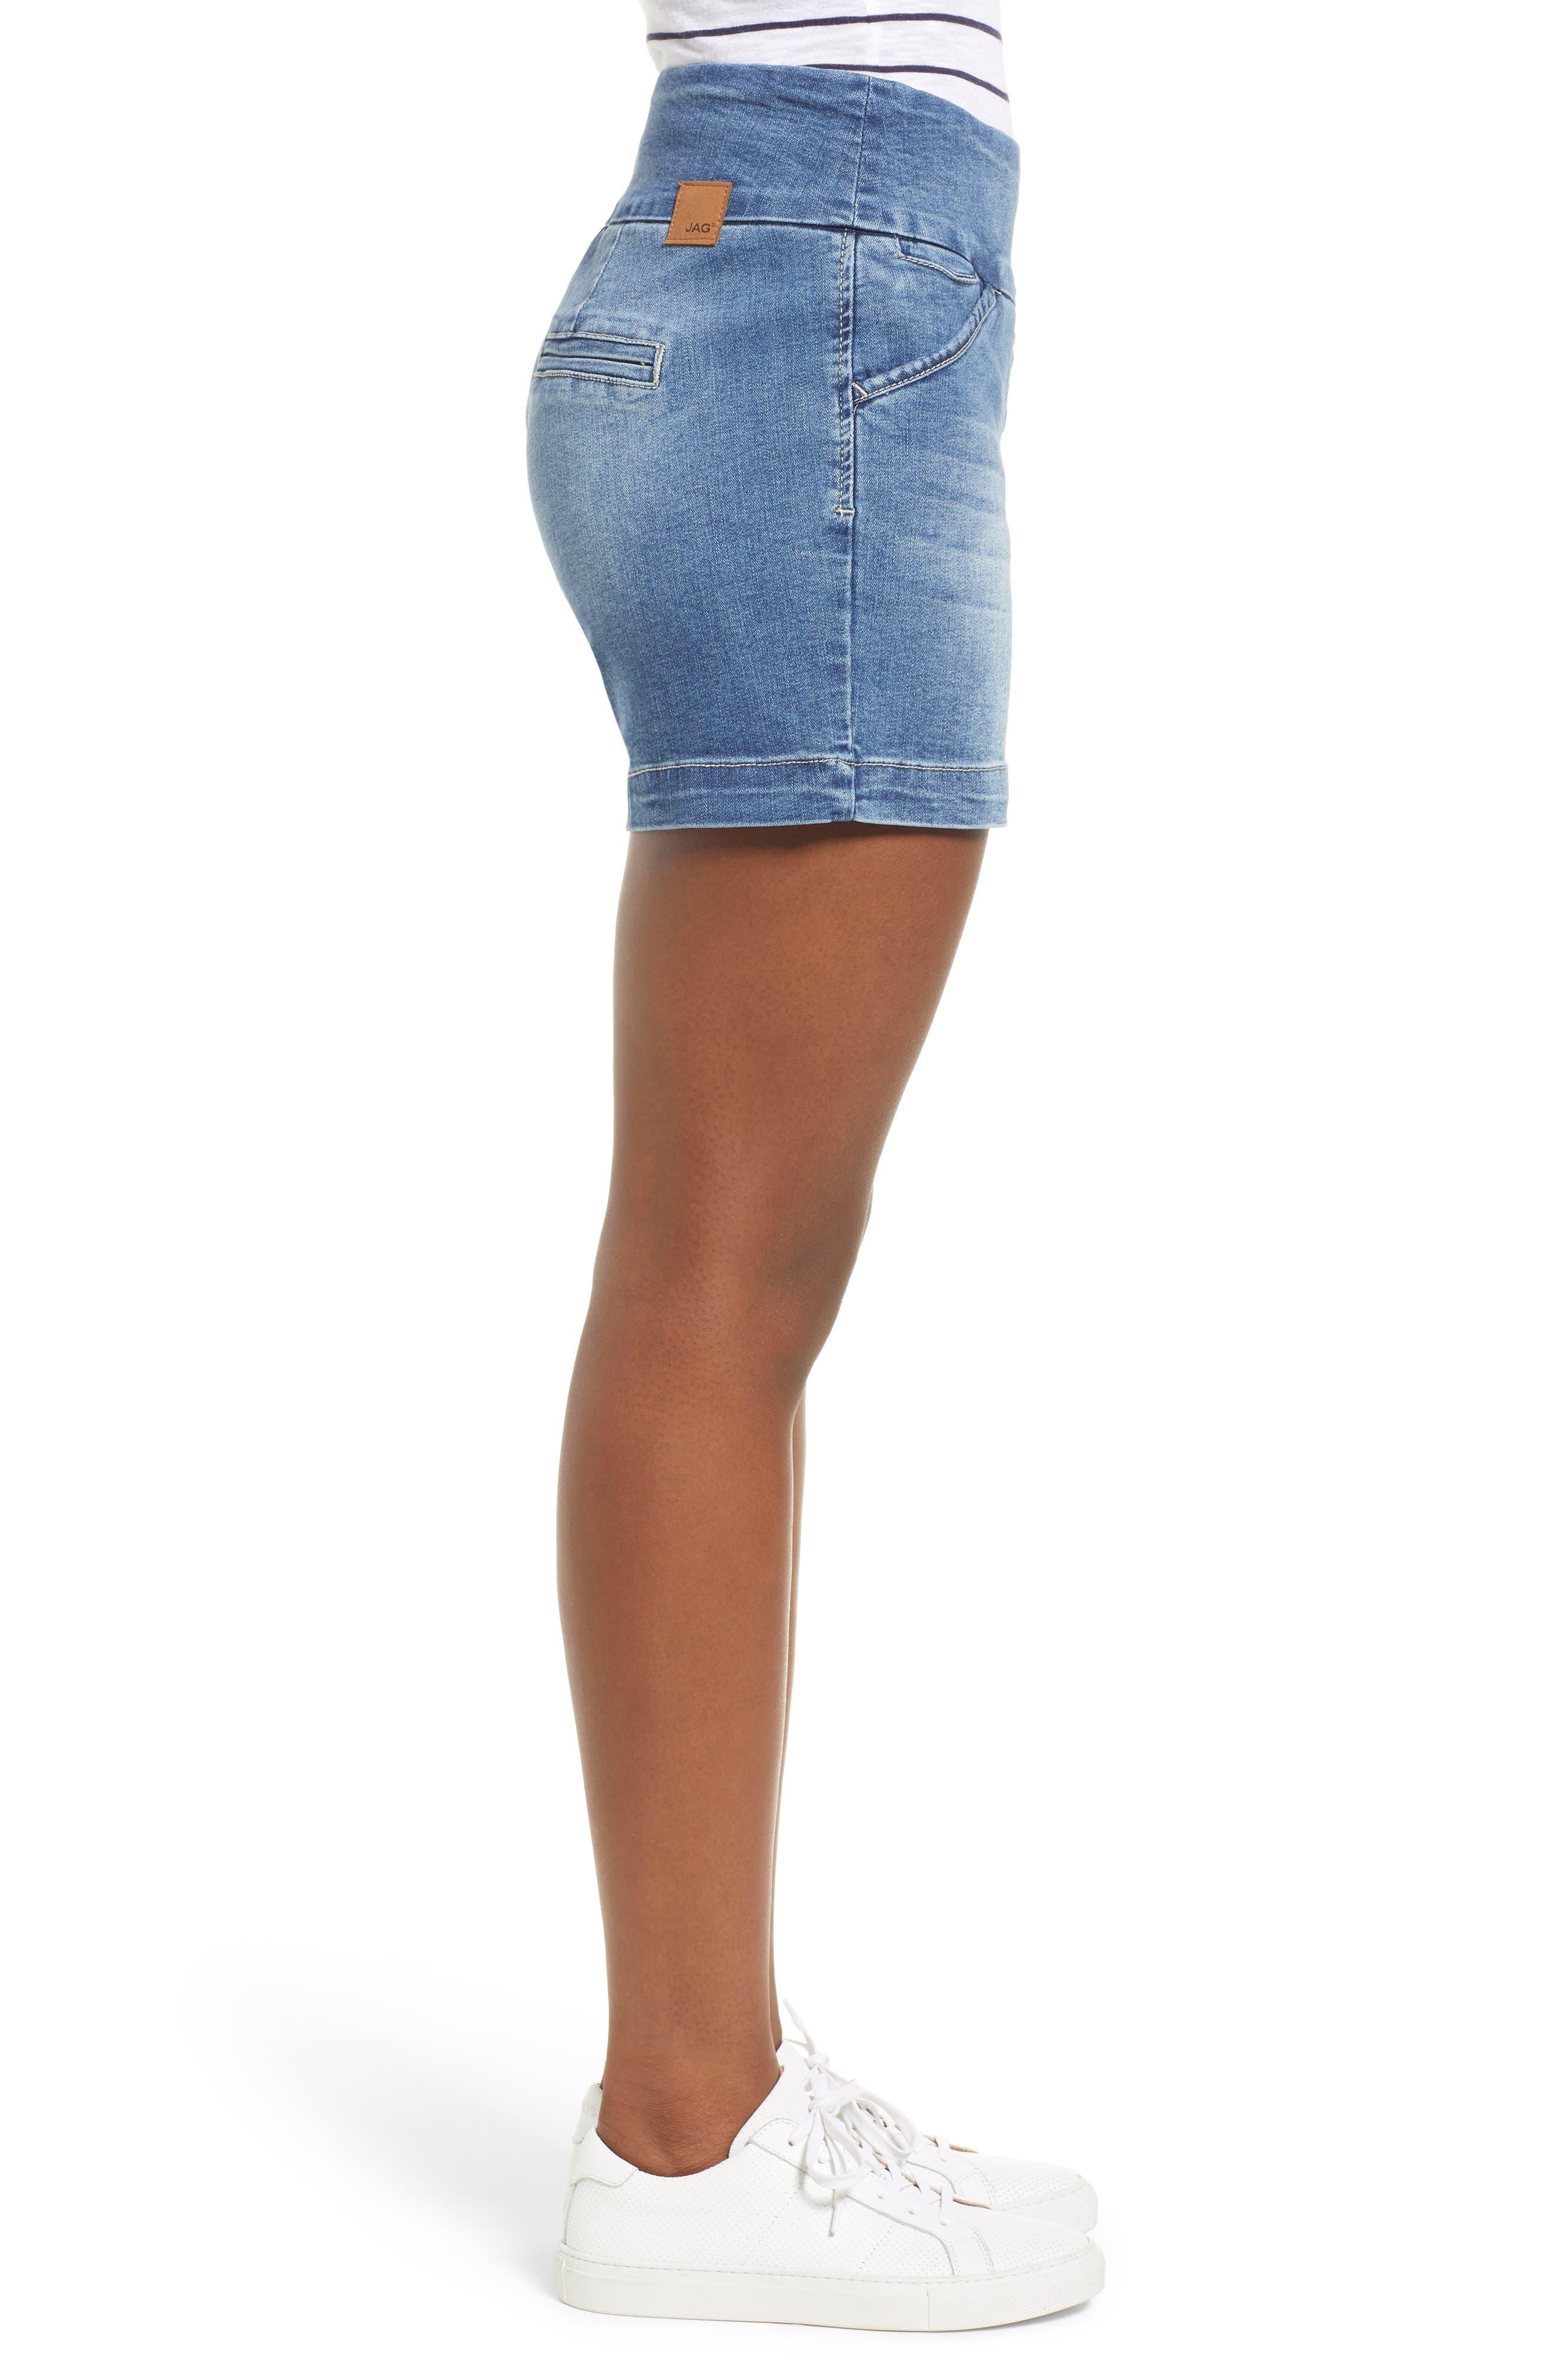 Ainsley 5 Denim Shorts,                             Alternate thumbnail 3, color,                             420